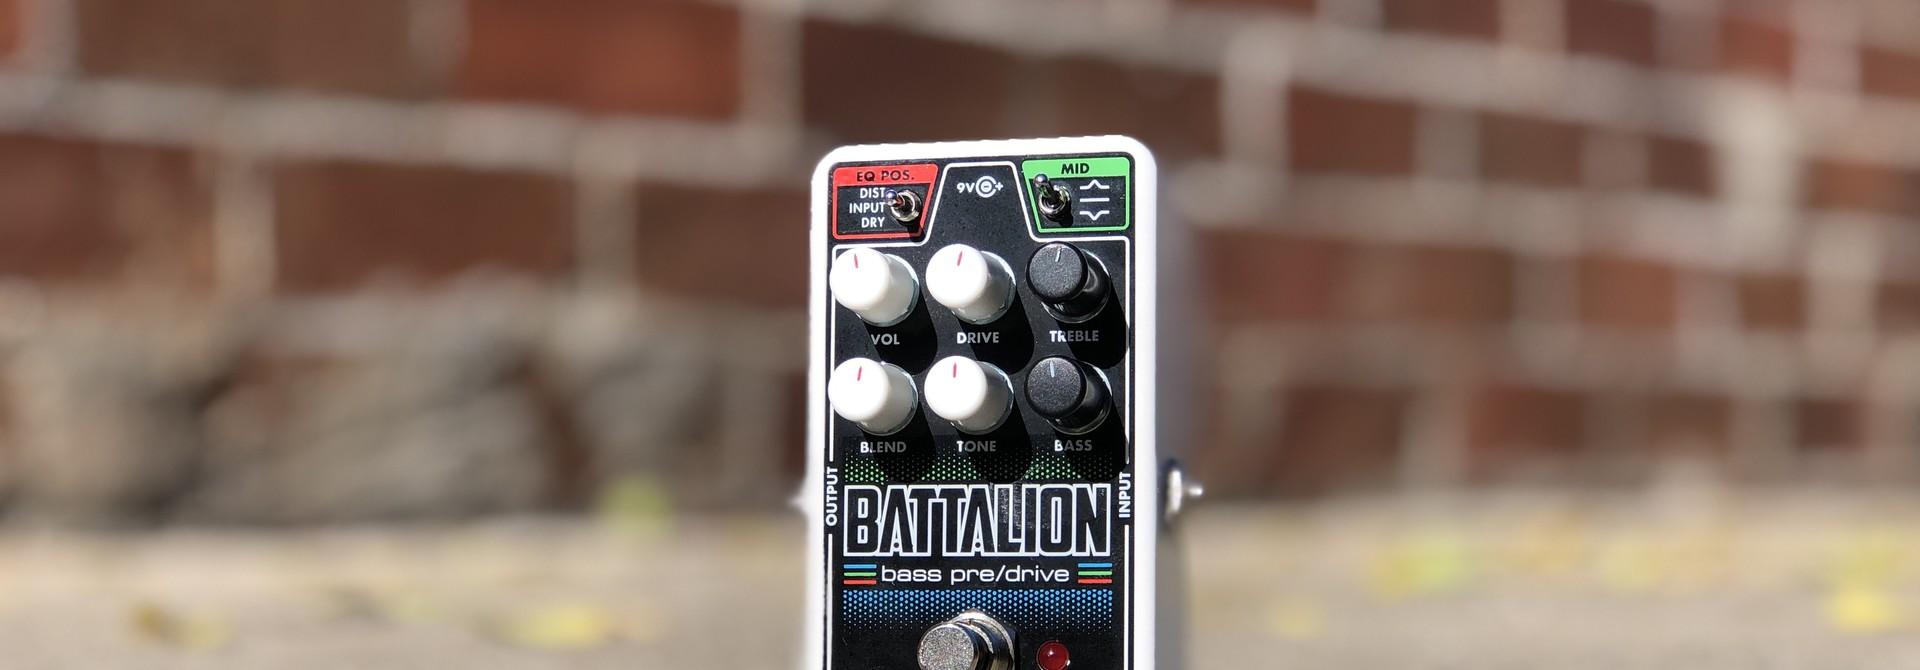 EHX Nano Battalion - Bass Preamp and overdrive